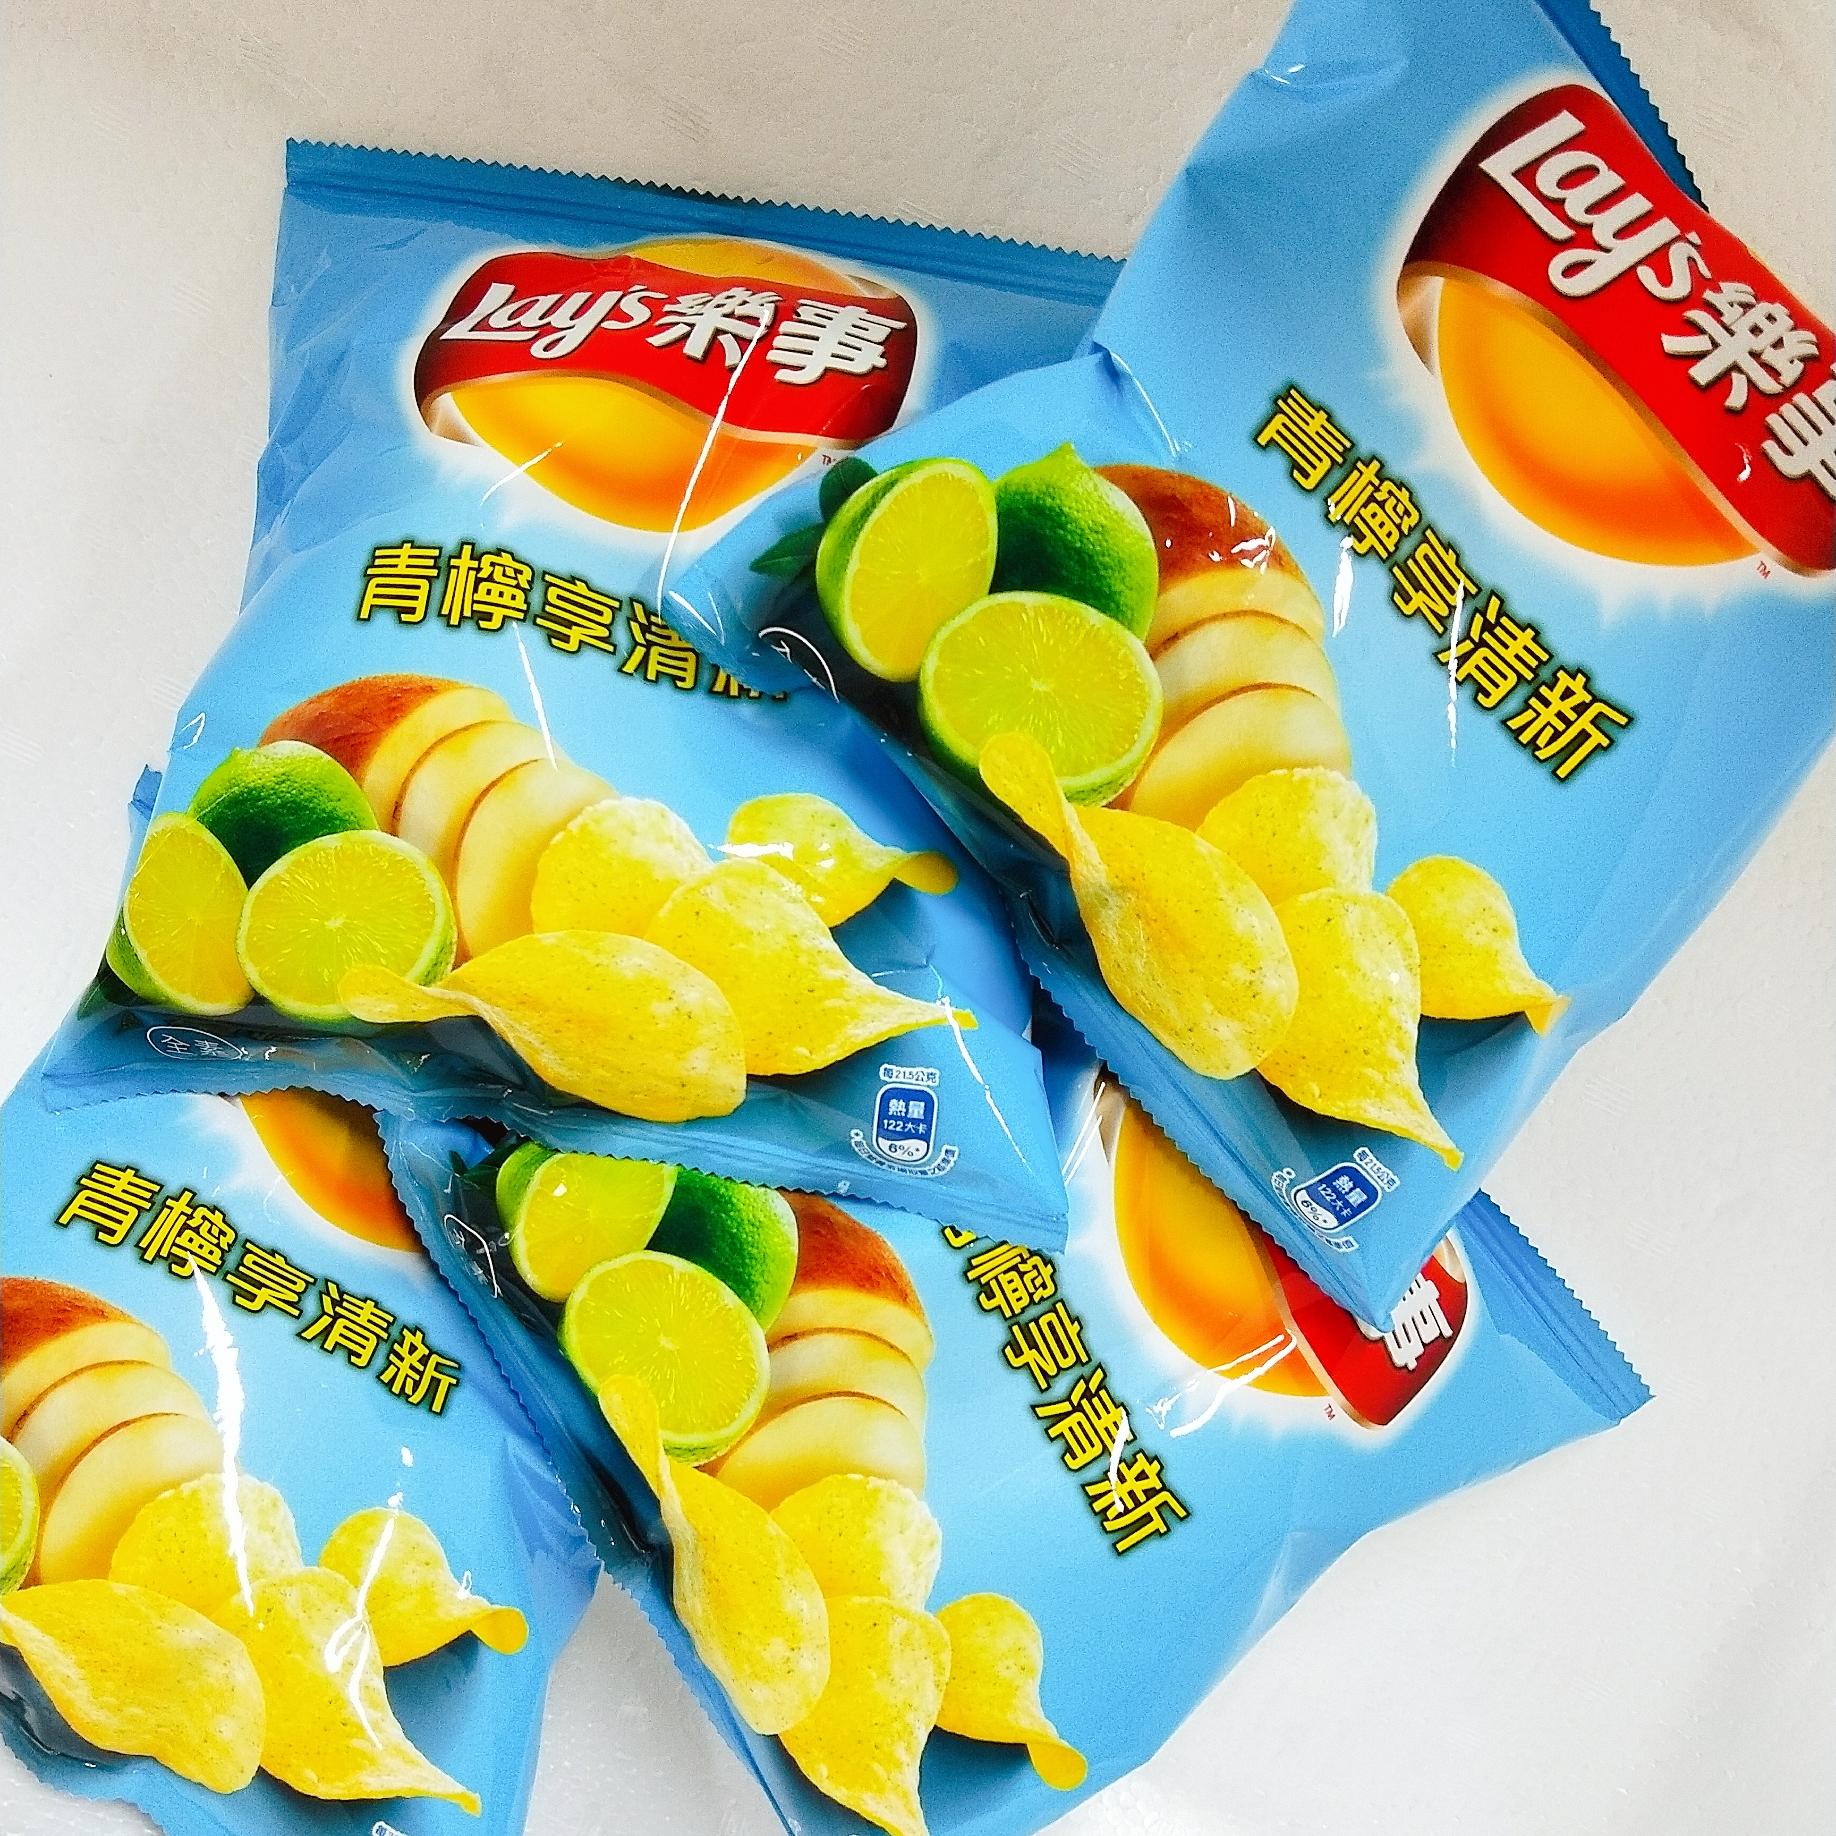 Image Lay's Lemon Potato Chip 凯式 - 乐事青柠享清新 43 grams